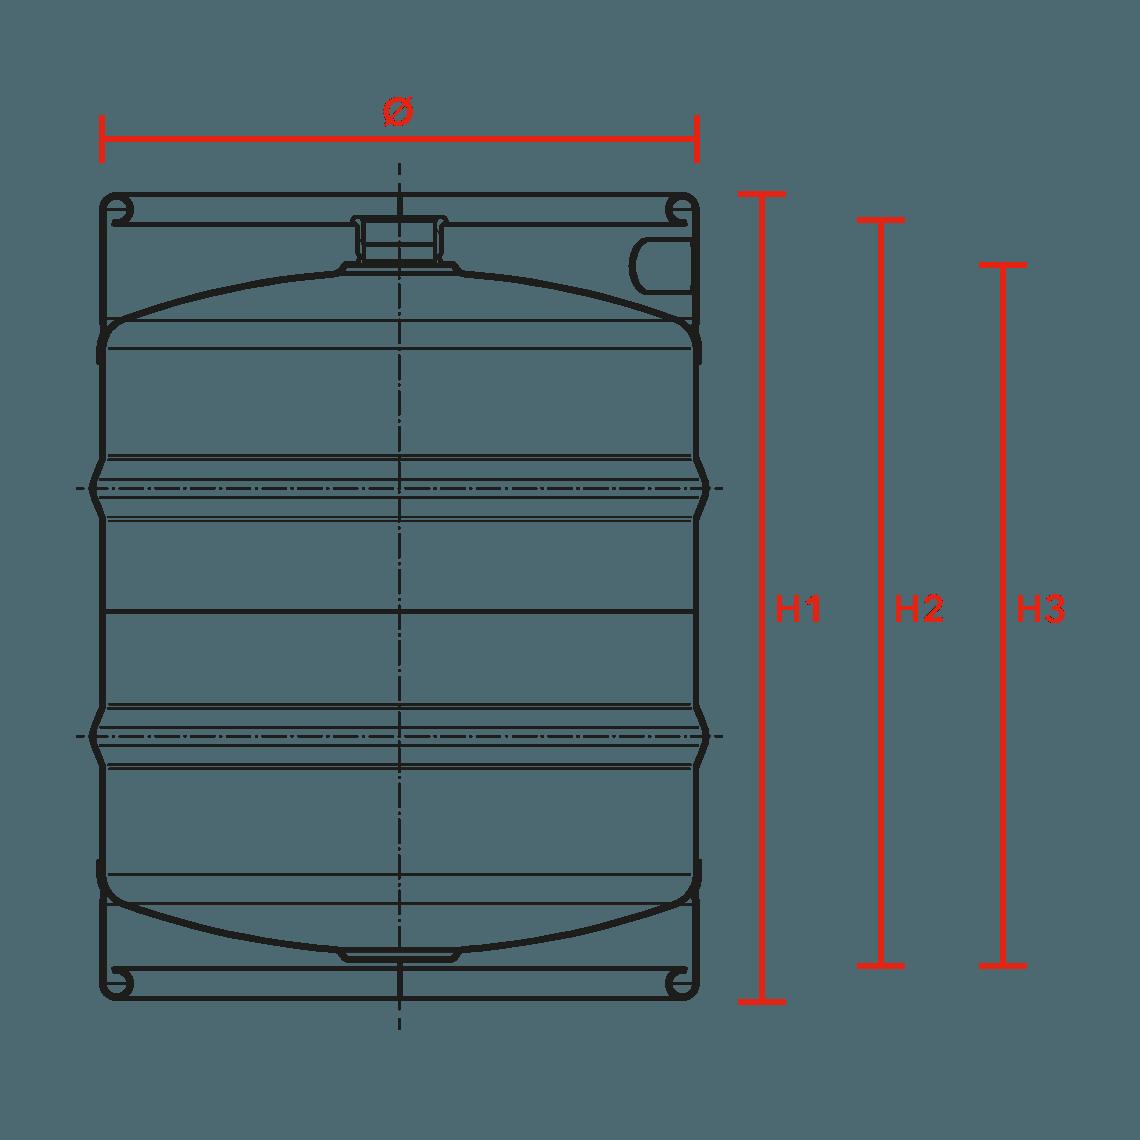 the euro keg maximum safety and reliabilitysafe stainless steel keg